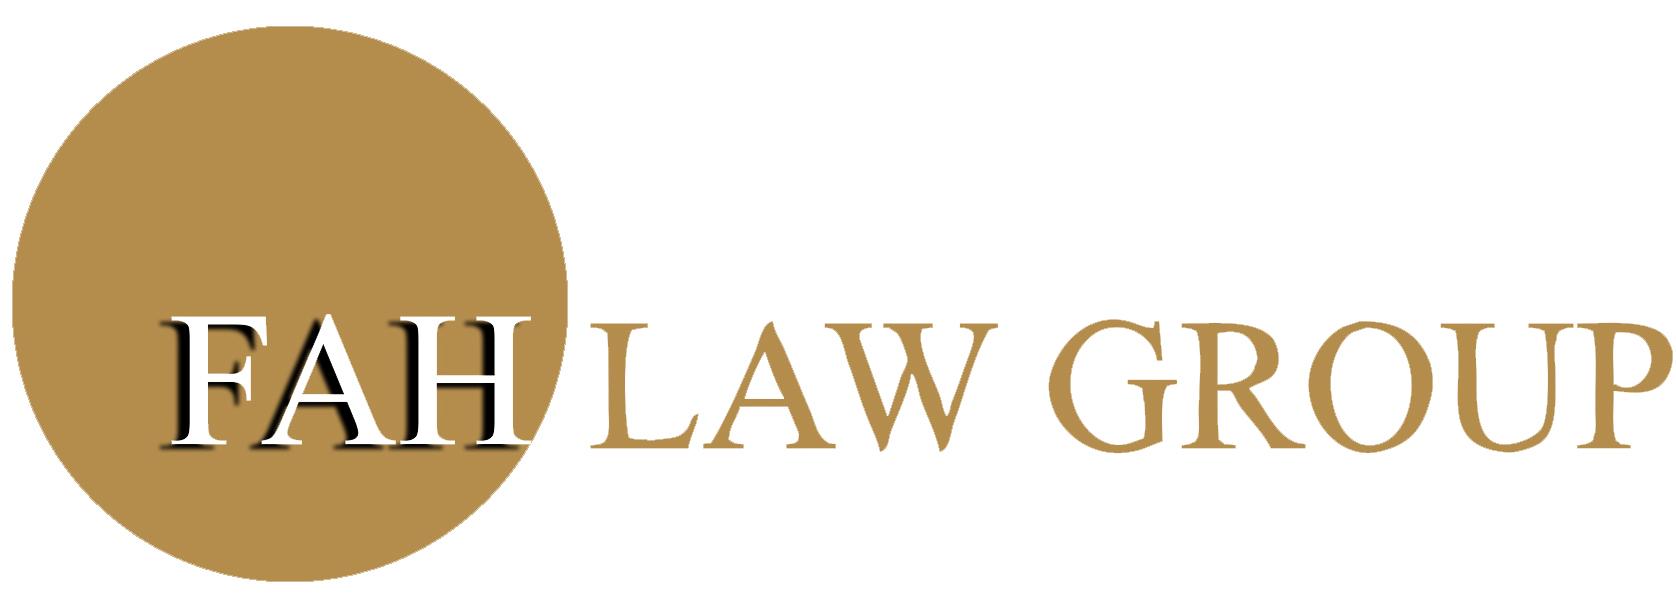 Fah_Law_Group_8-9-2019